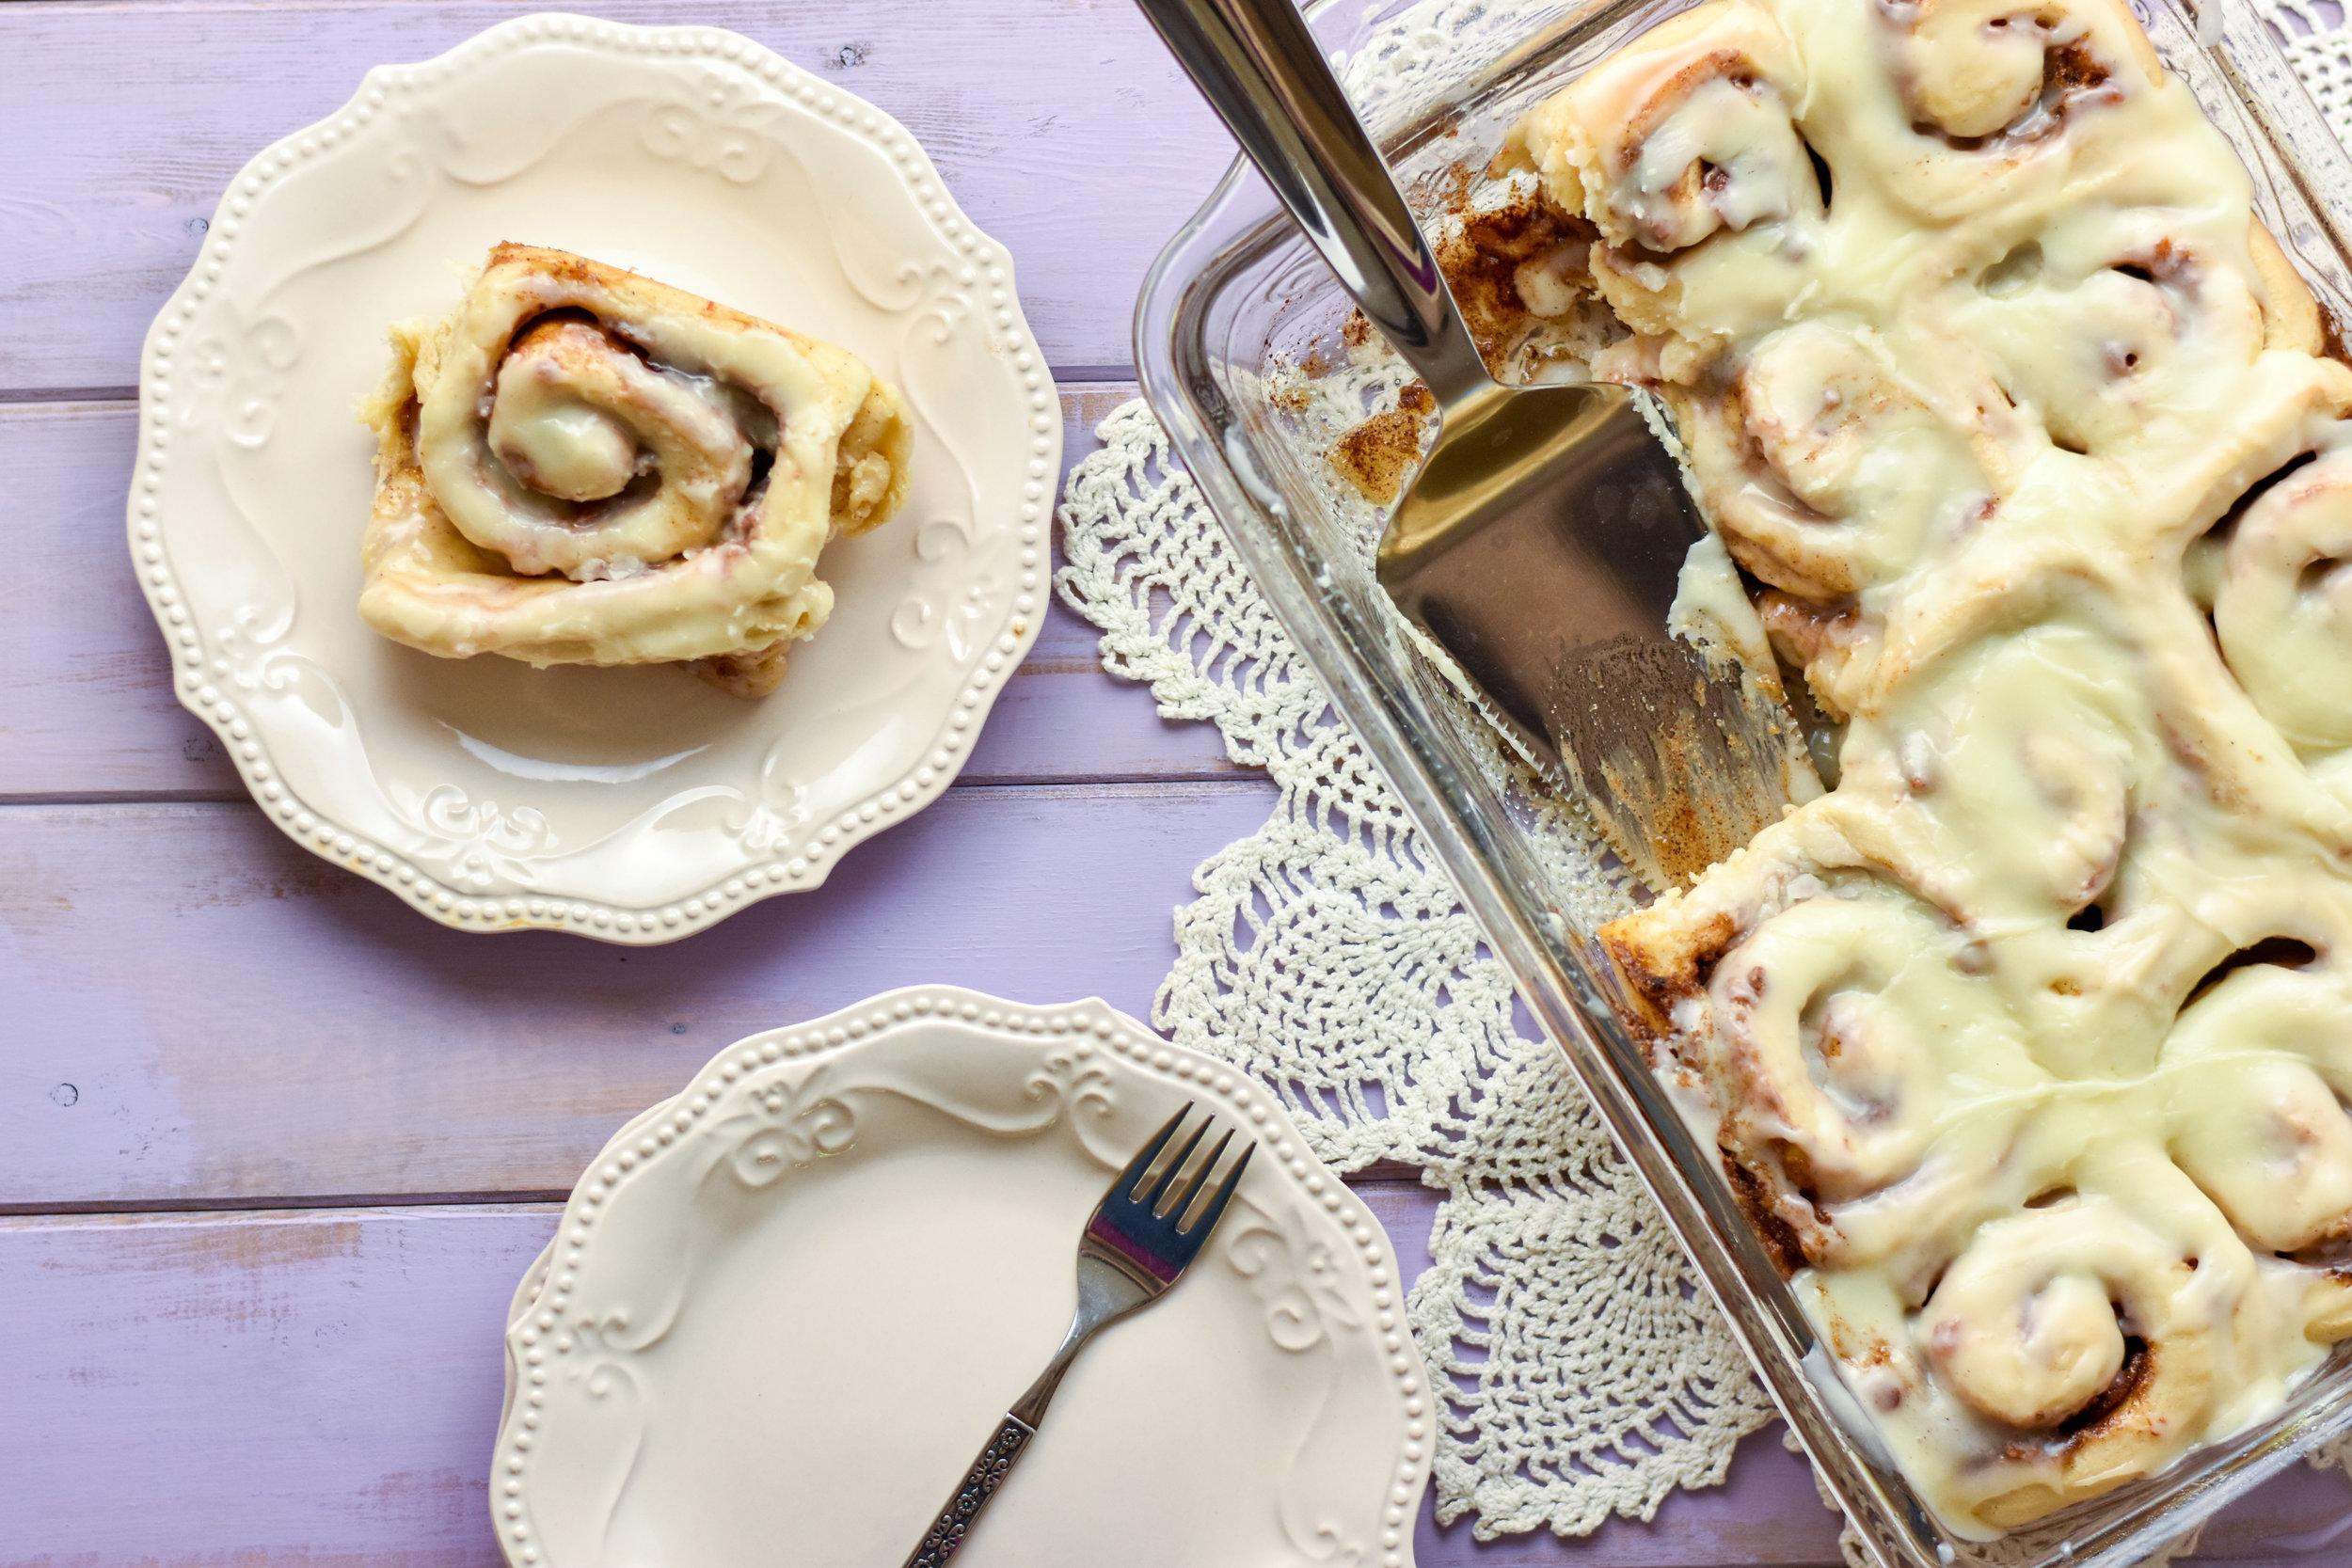 Brown Sugar Bacon Cinnamon Rolls with Maple Icing